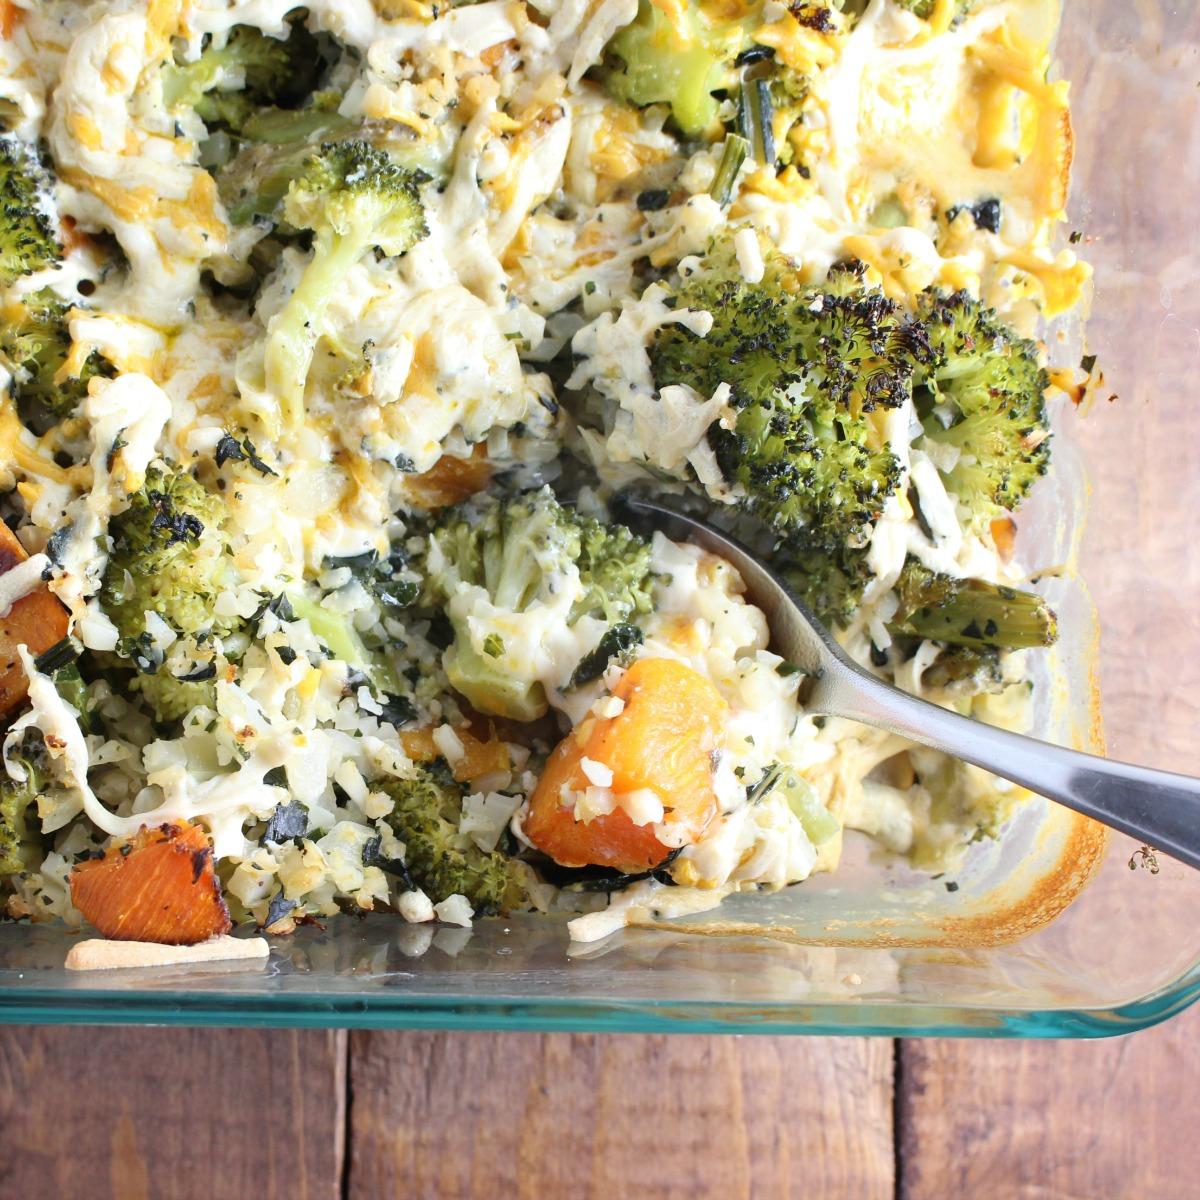 Broccoli Cheese Cauli Rice Casserole 1200x1200.jpg